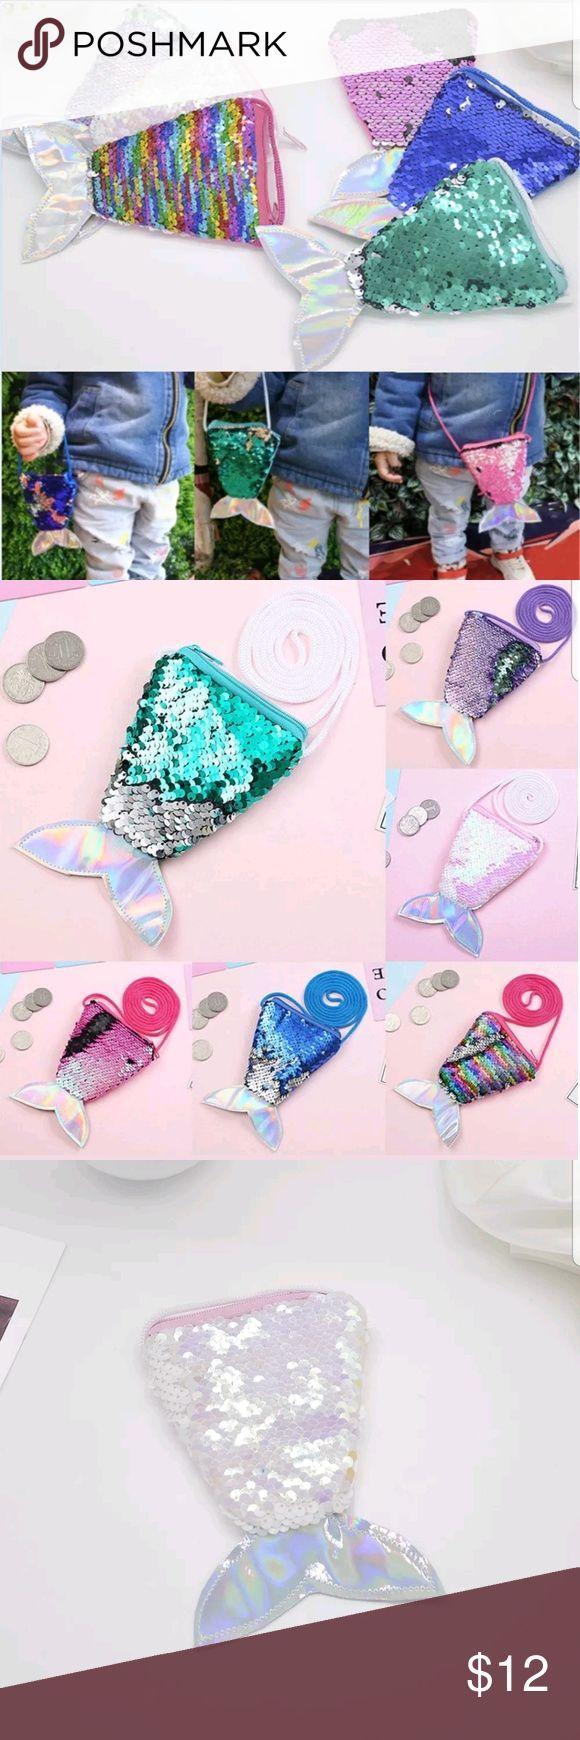 GIRL MERMAID crossbody bag 100 Brand New and High Quality